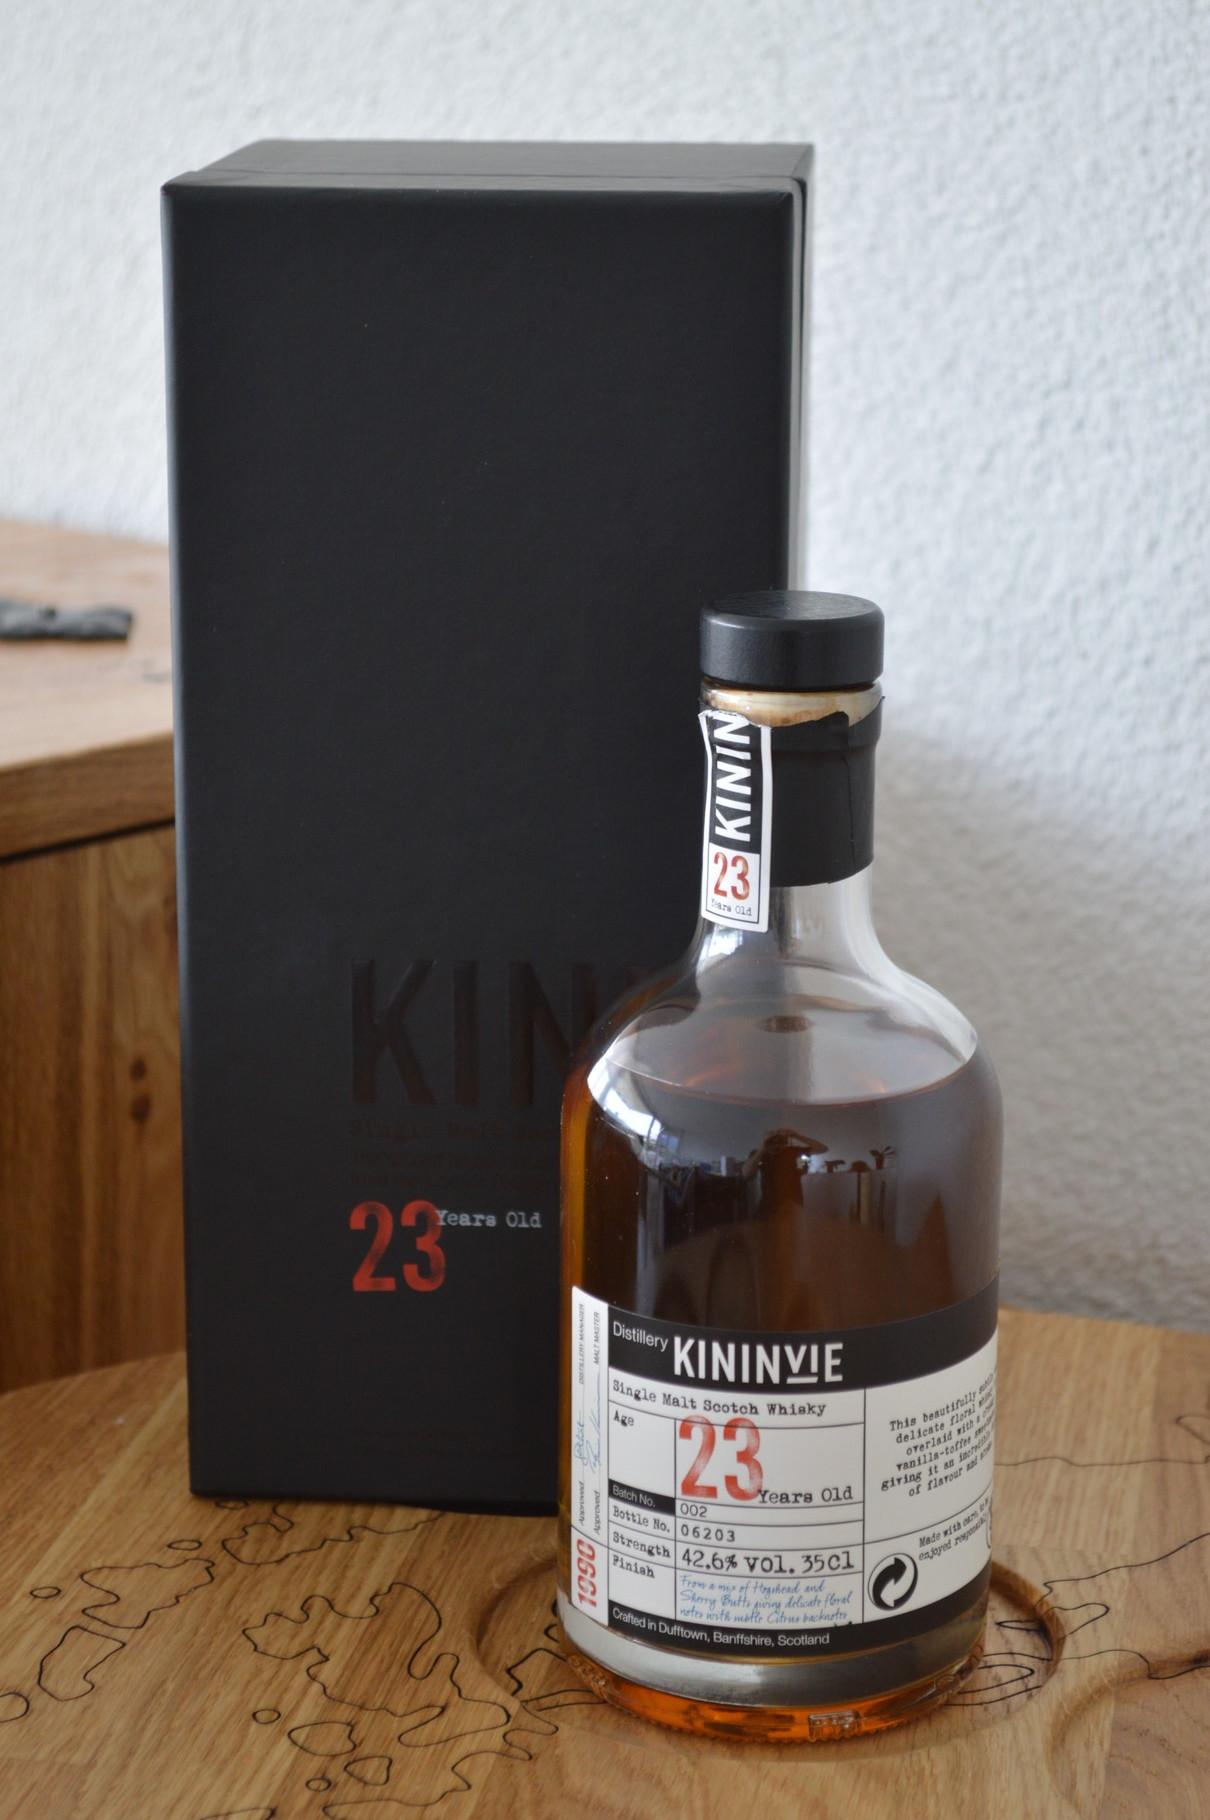 SPEYSIDE - Kininvie* - Age: 23 years - Bottler: Original - 35cl - 42,6% - Batch No. 2